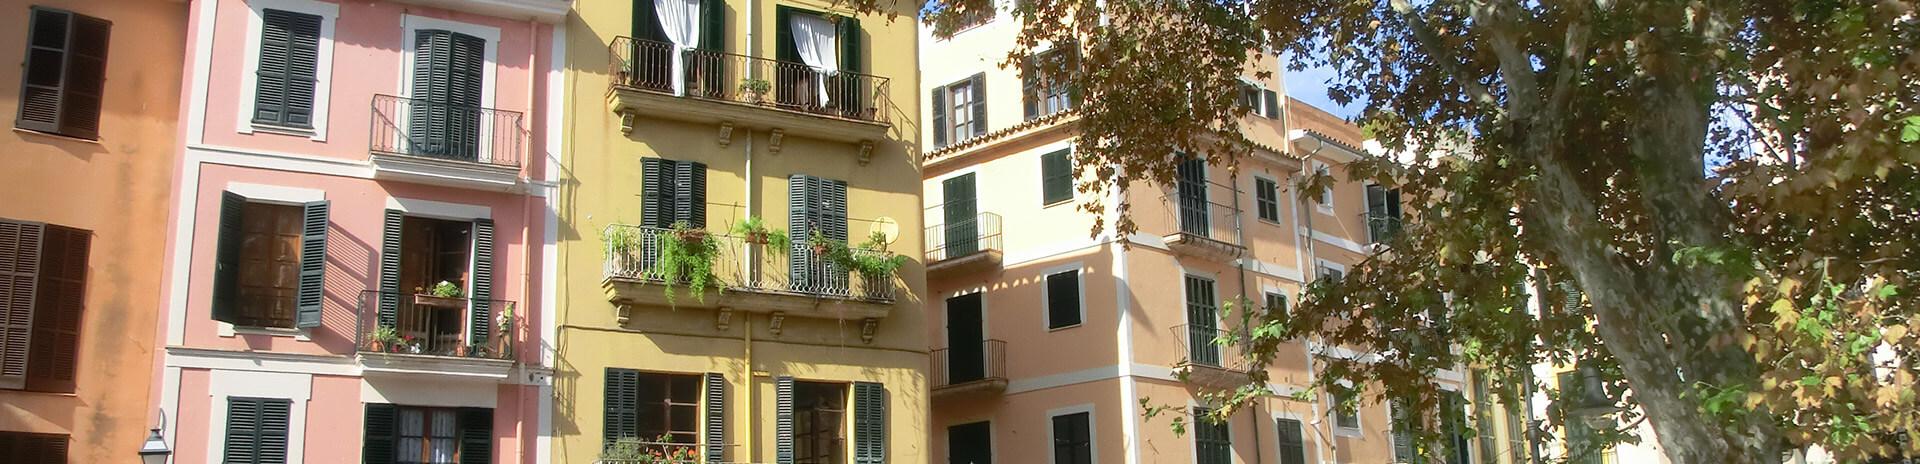 Etagenwohnung Palma de Mallorca